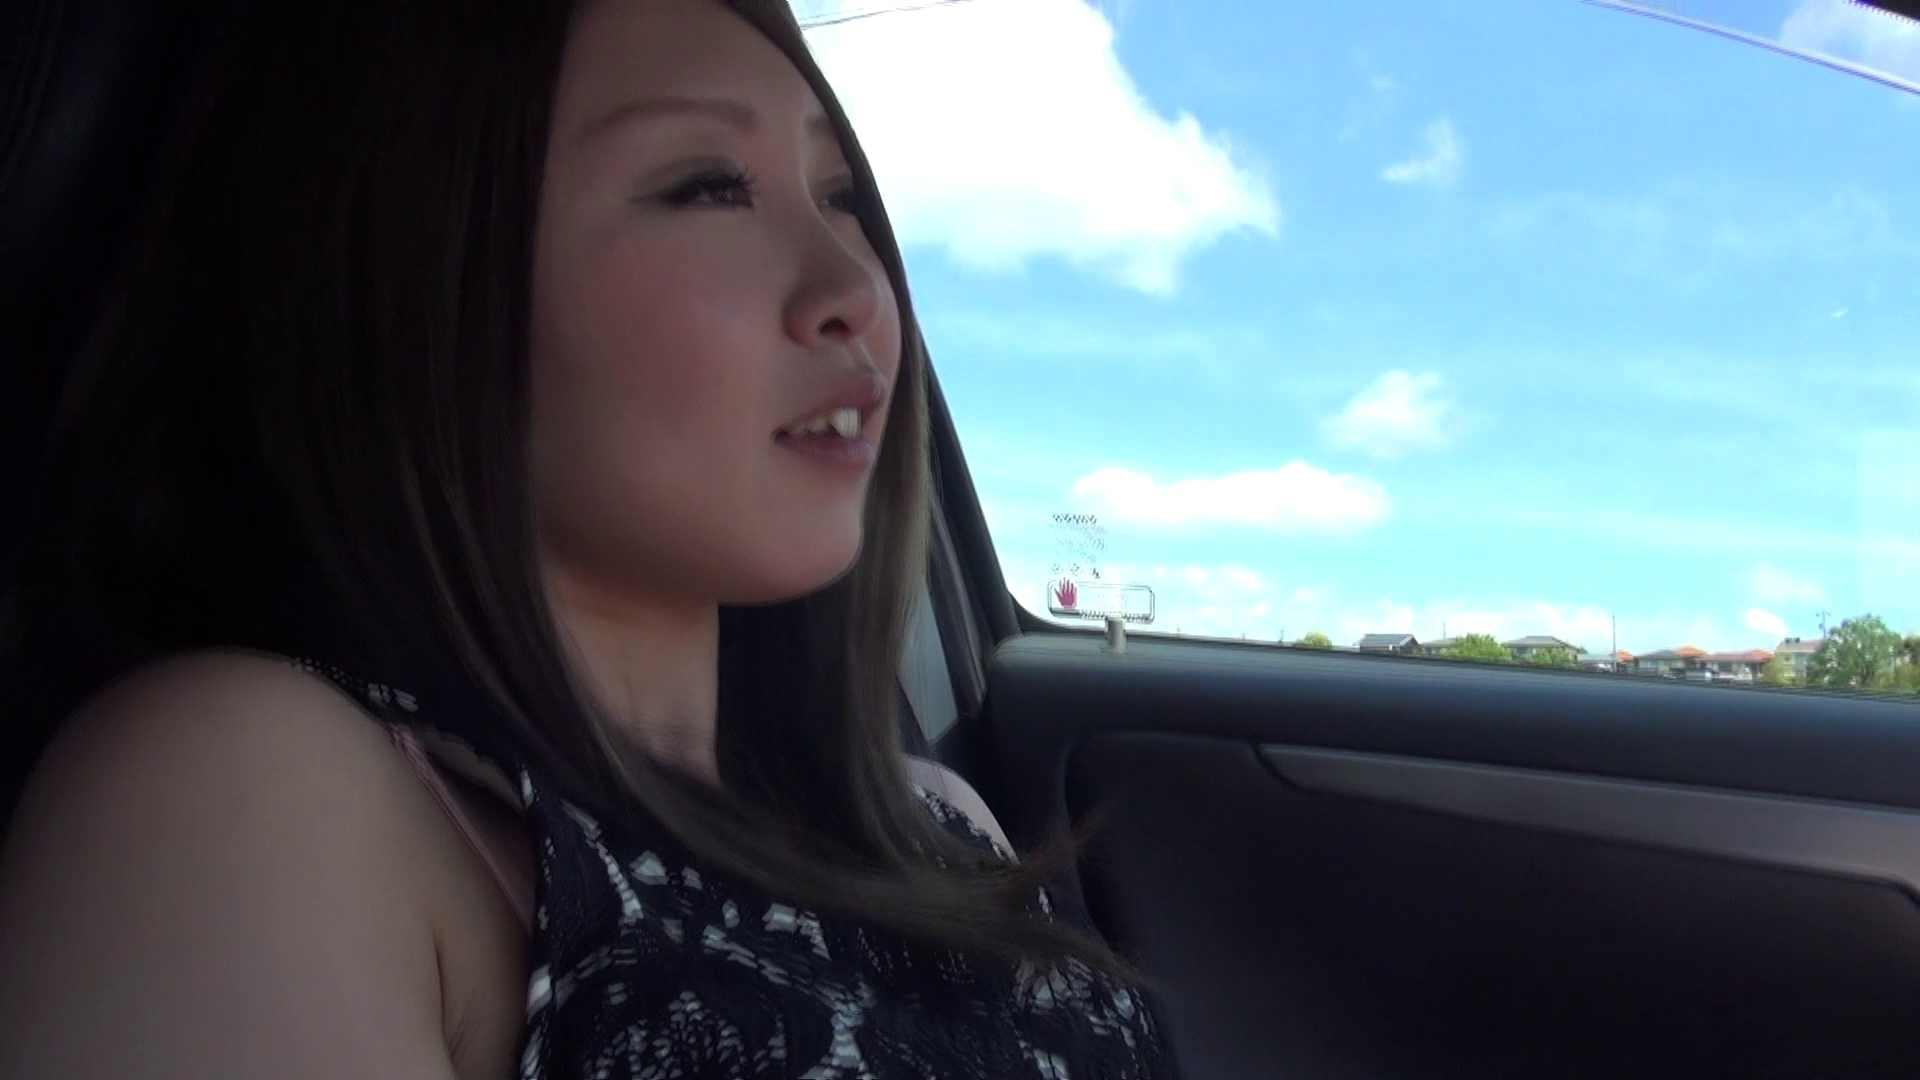 episode6 ドライブ中に・・・妻に強せいオナニー オナニー  106pic 15